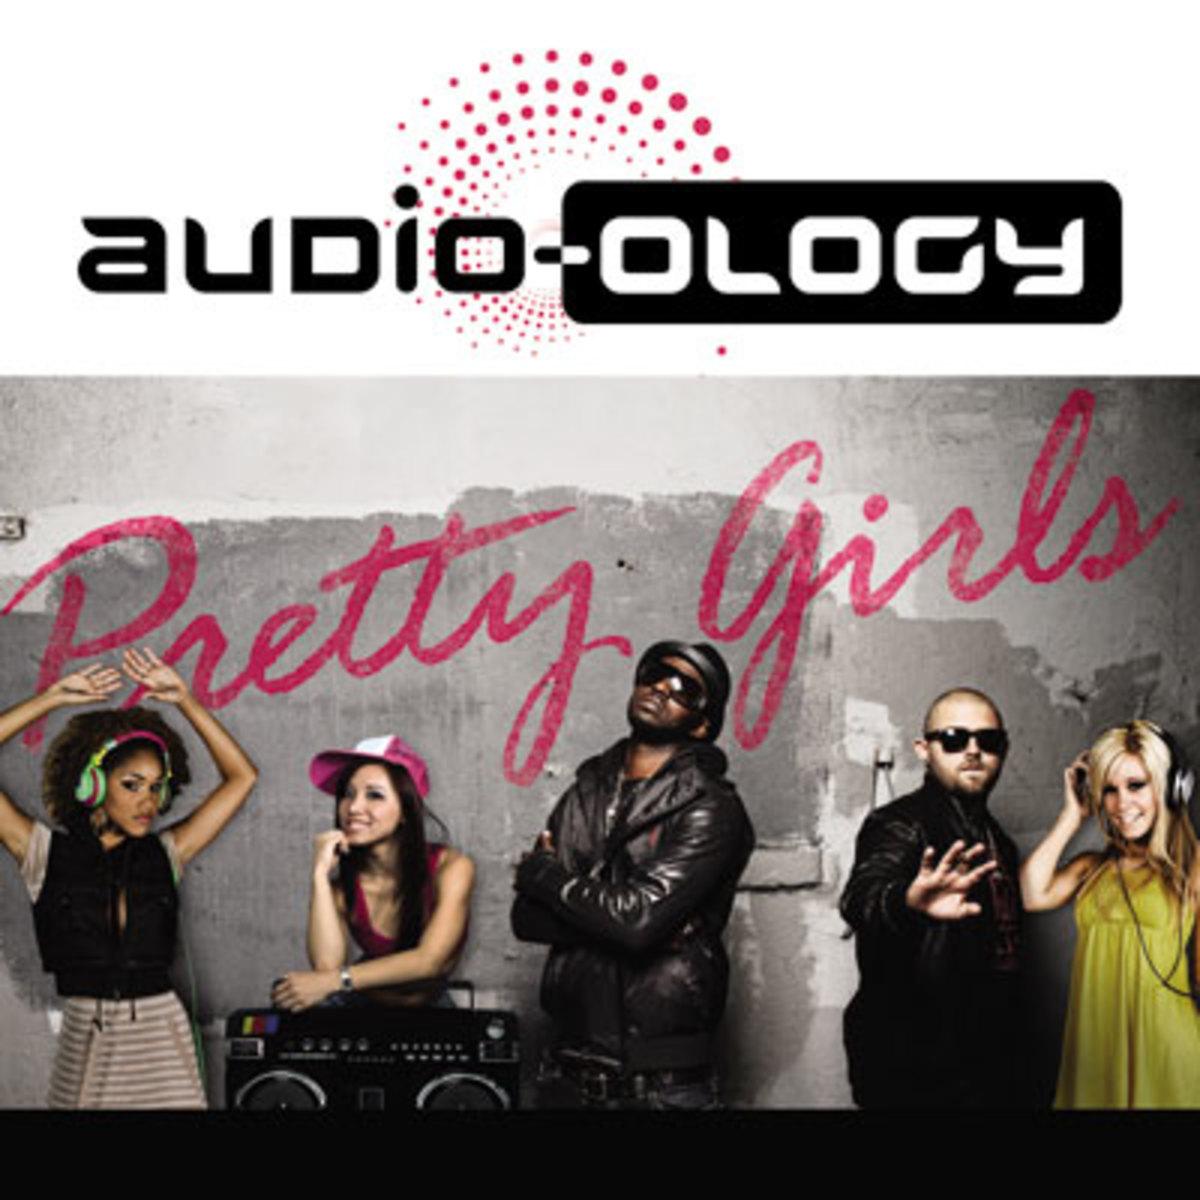 audioology-prettygirls.jpg